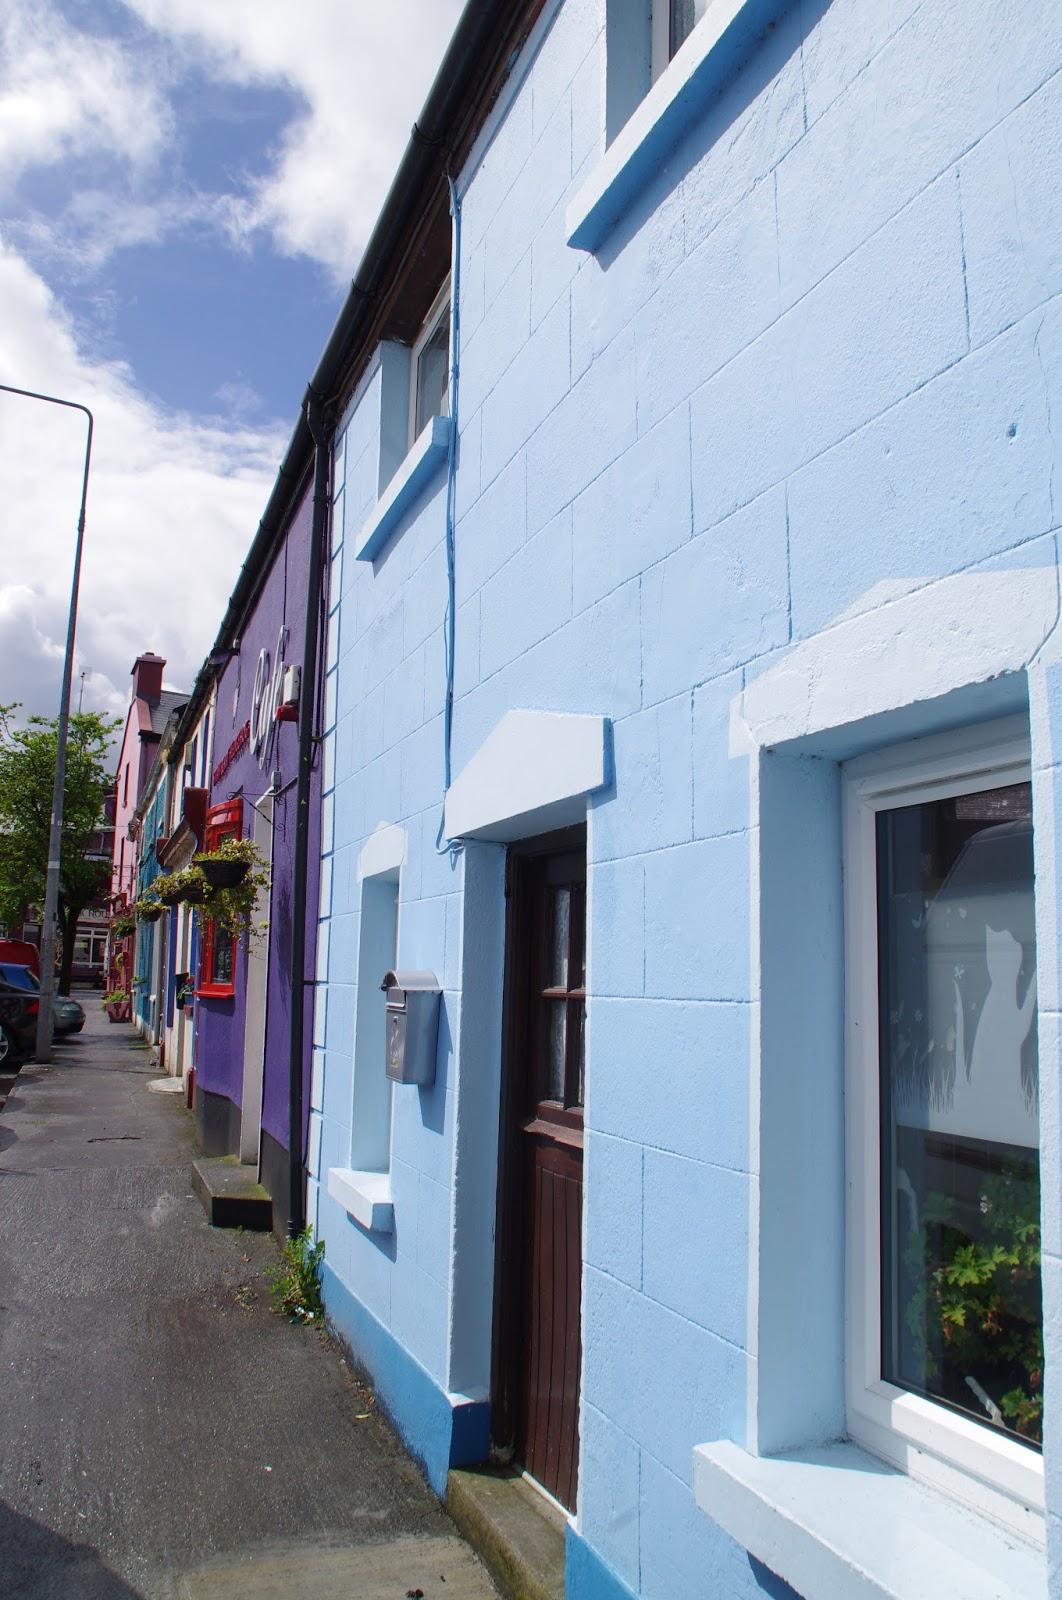 Colourful houses in Kinvara Ireland